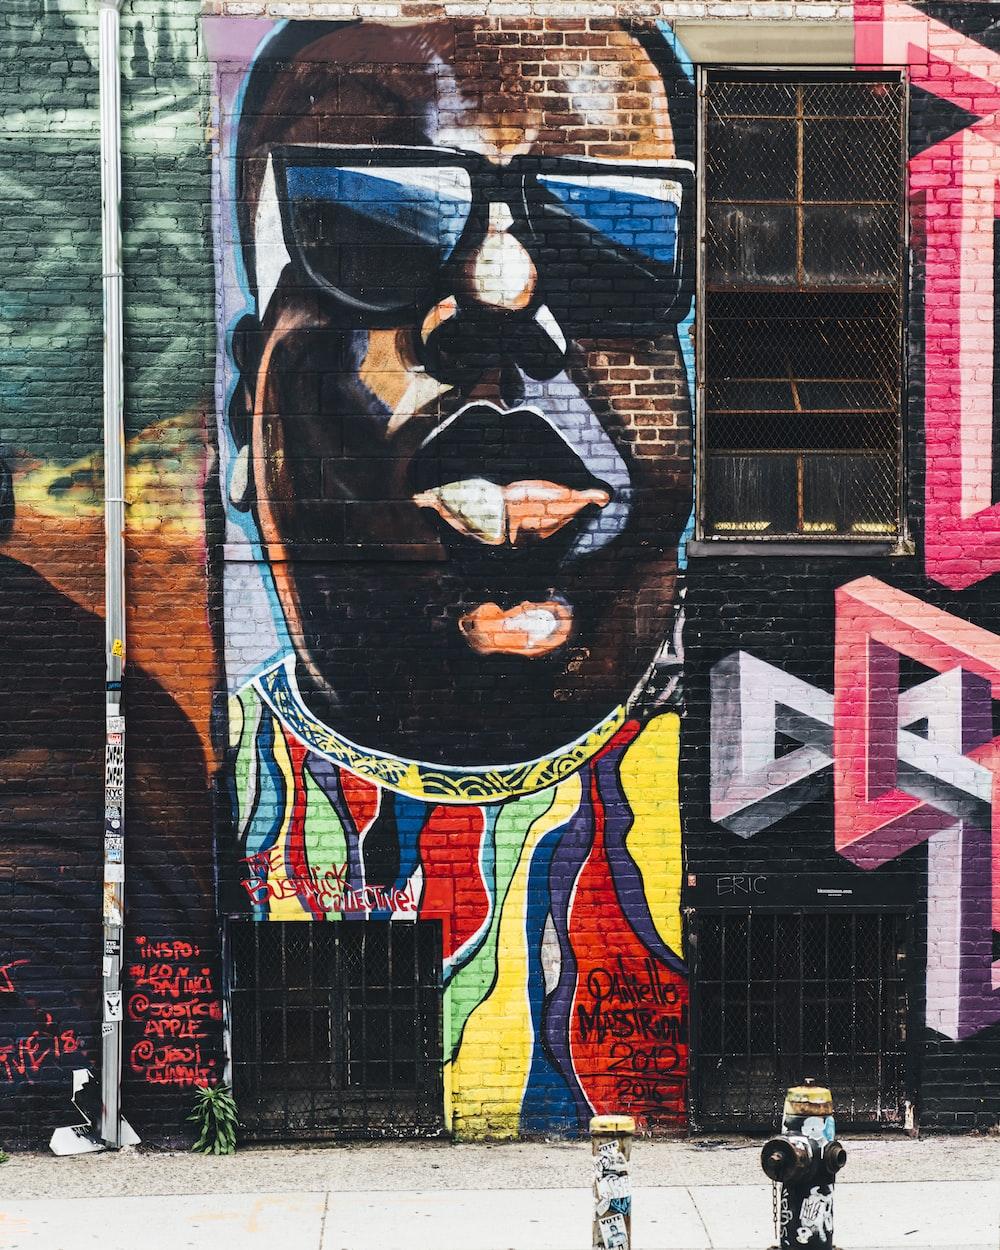 man wearing black sunglasses wall painting